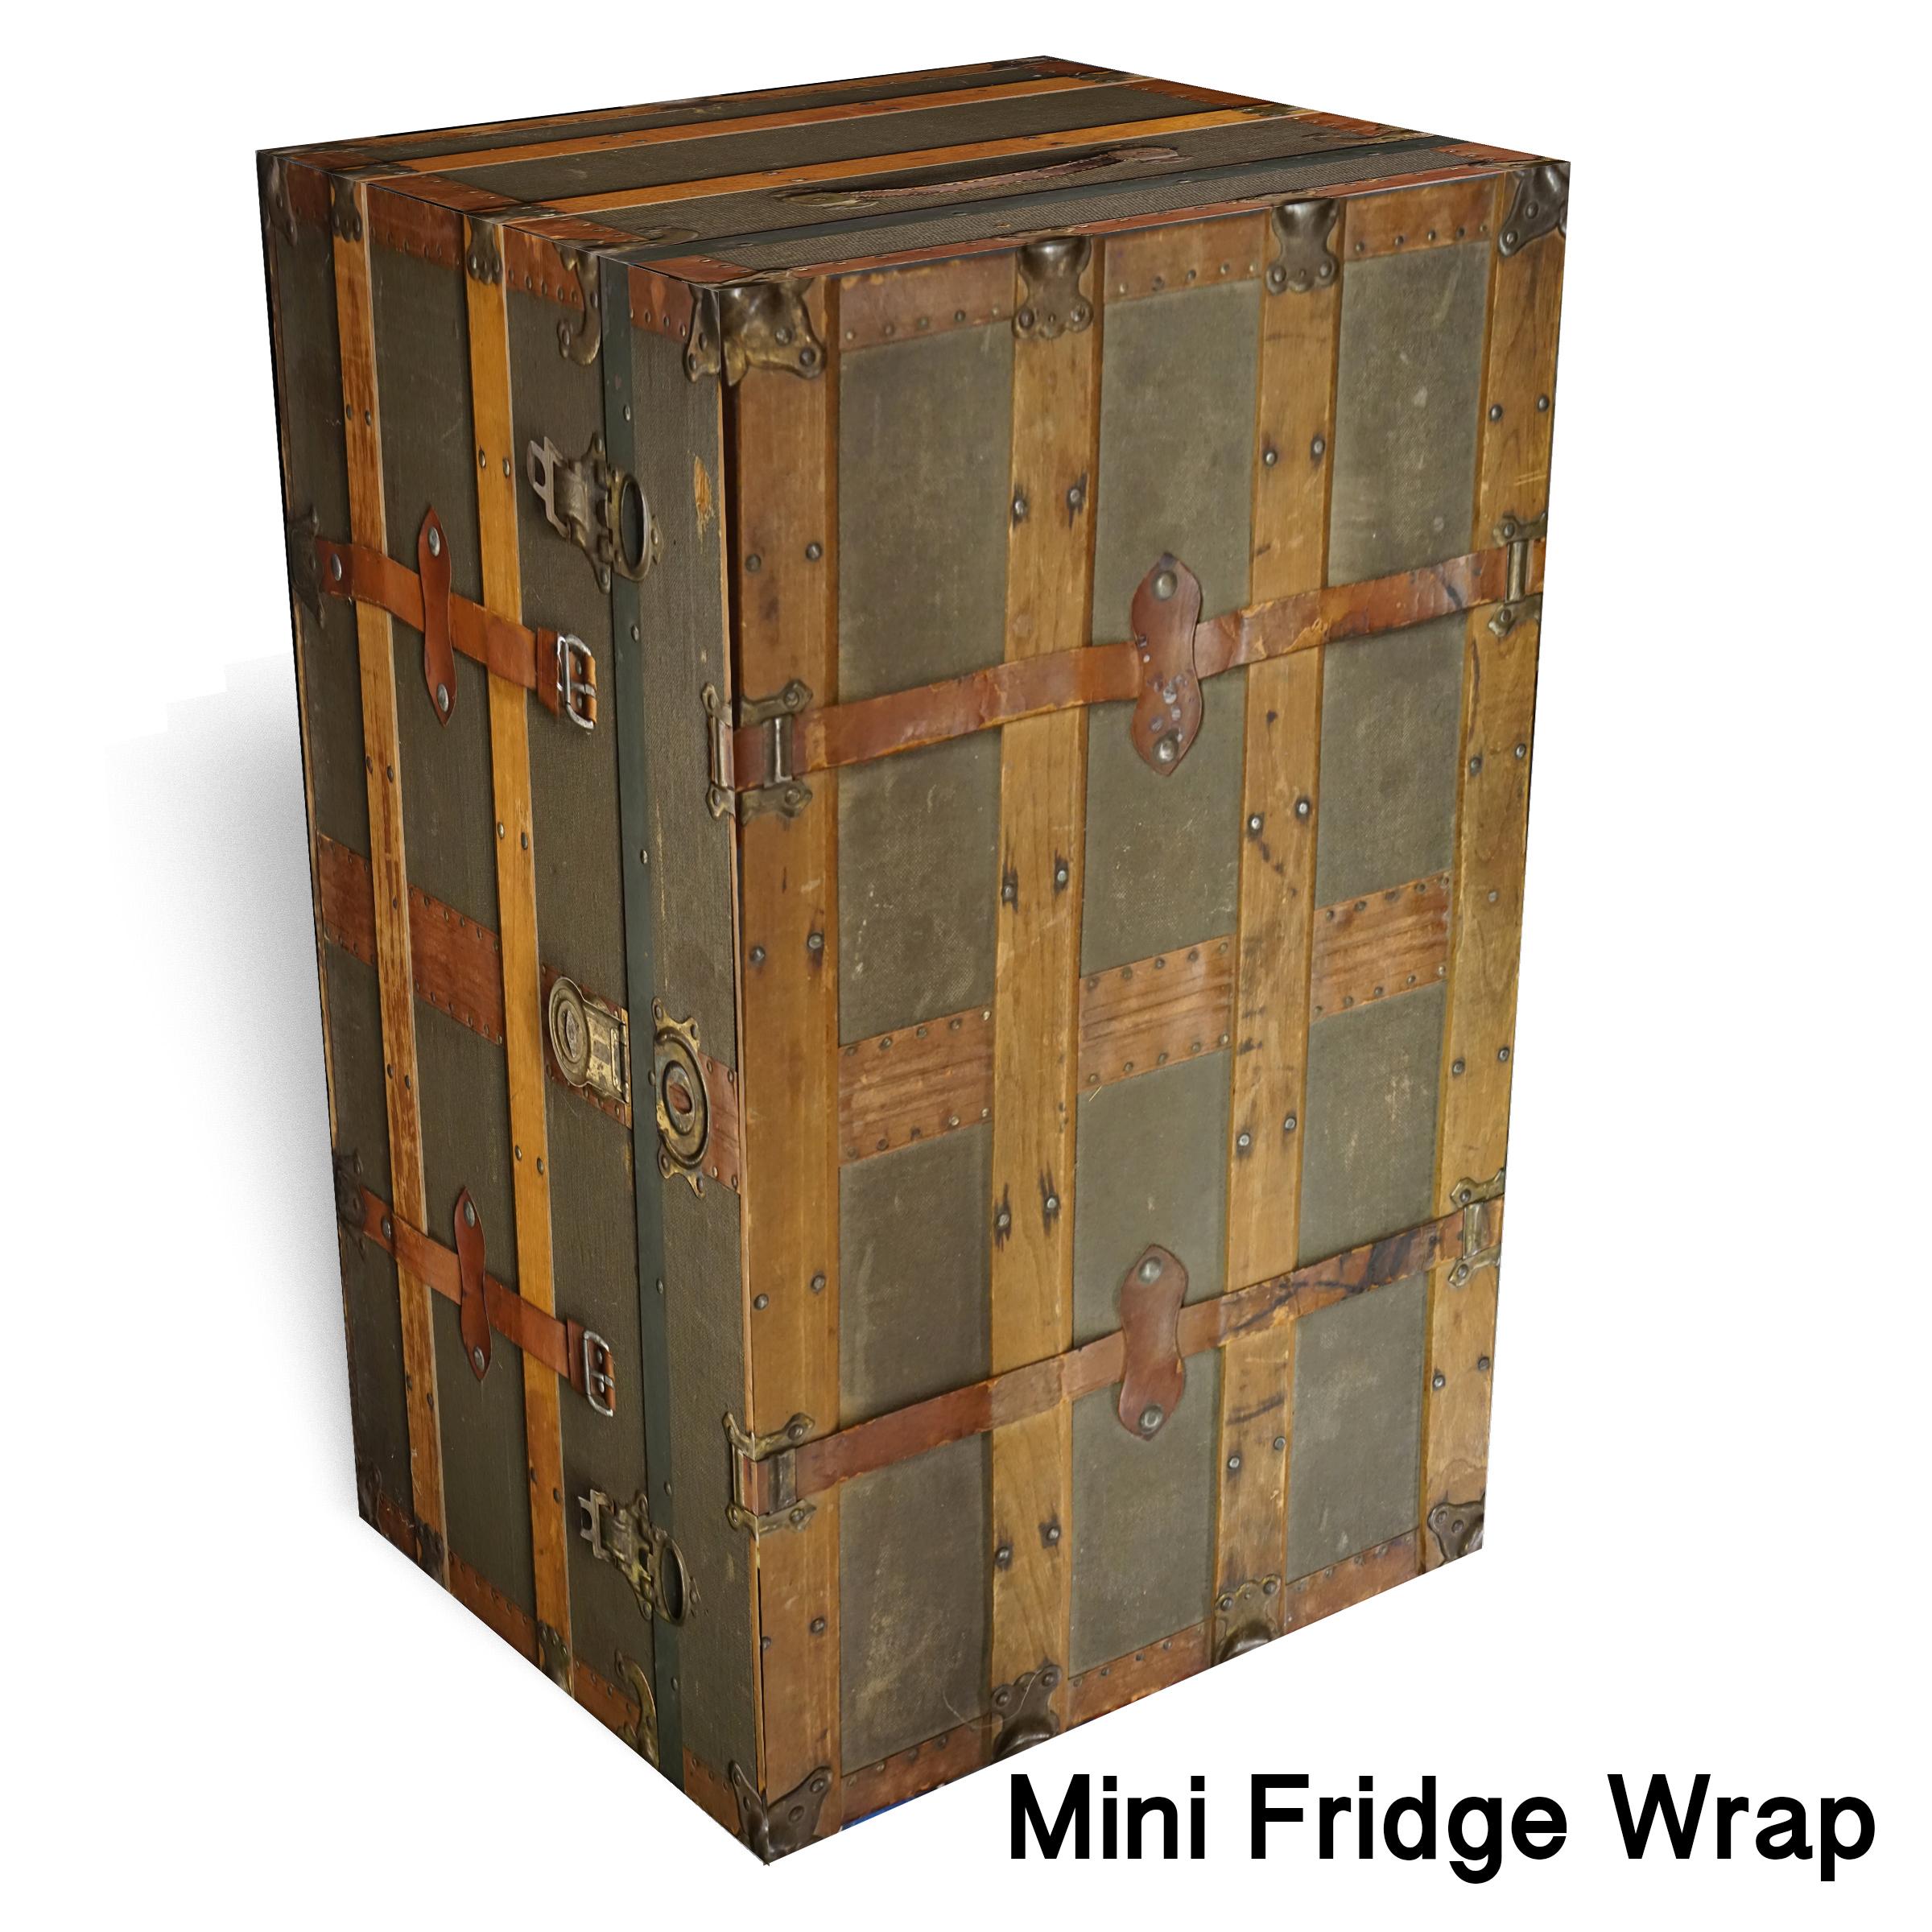 Chest trunk Vintage mini fridge wrap